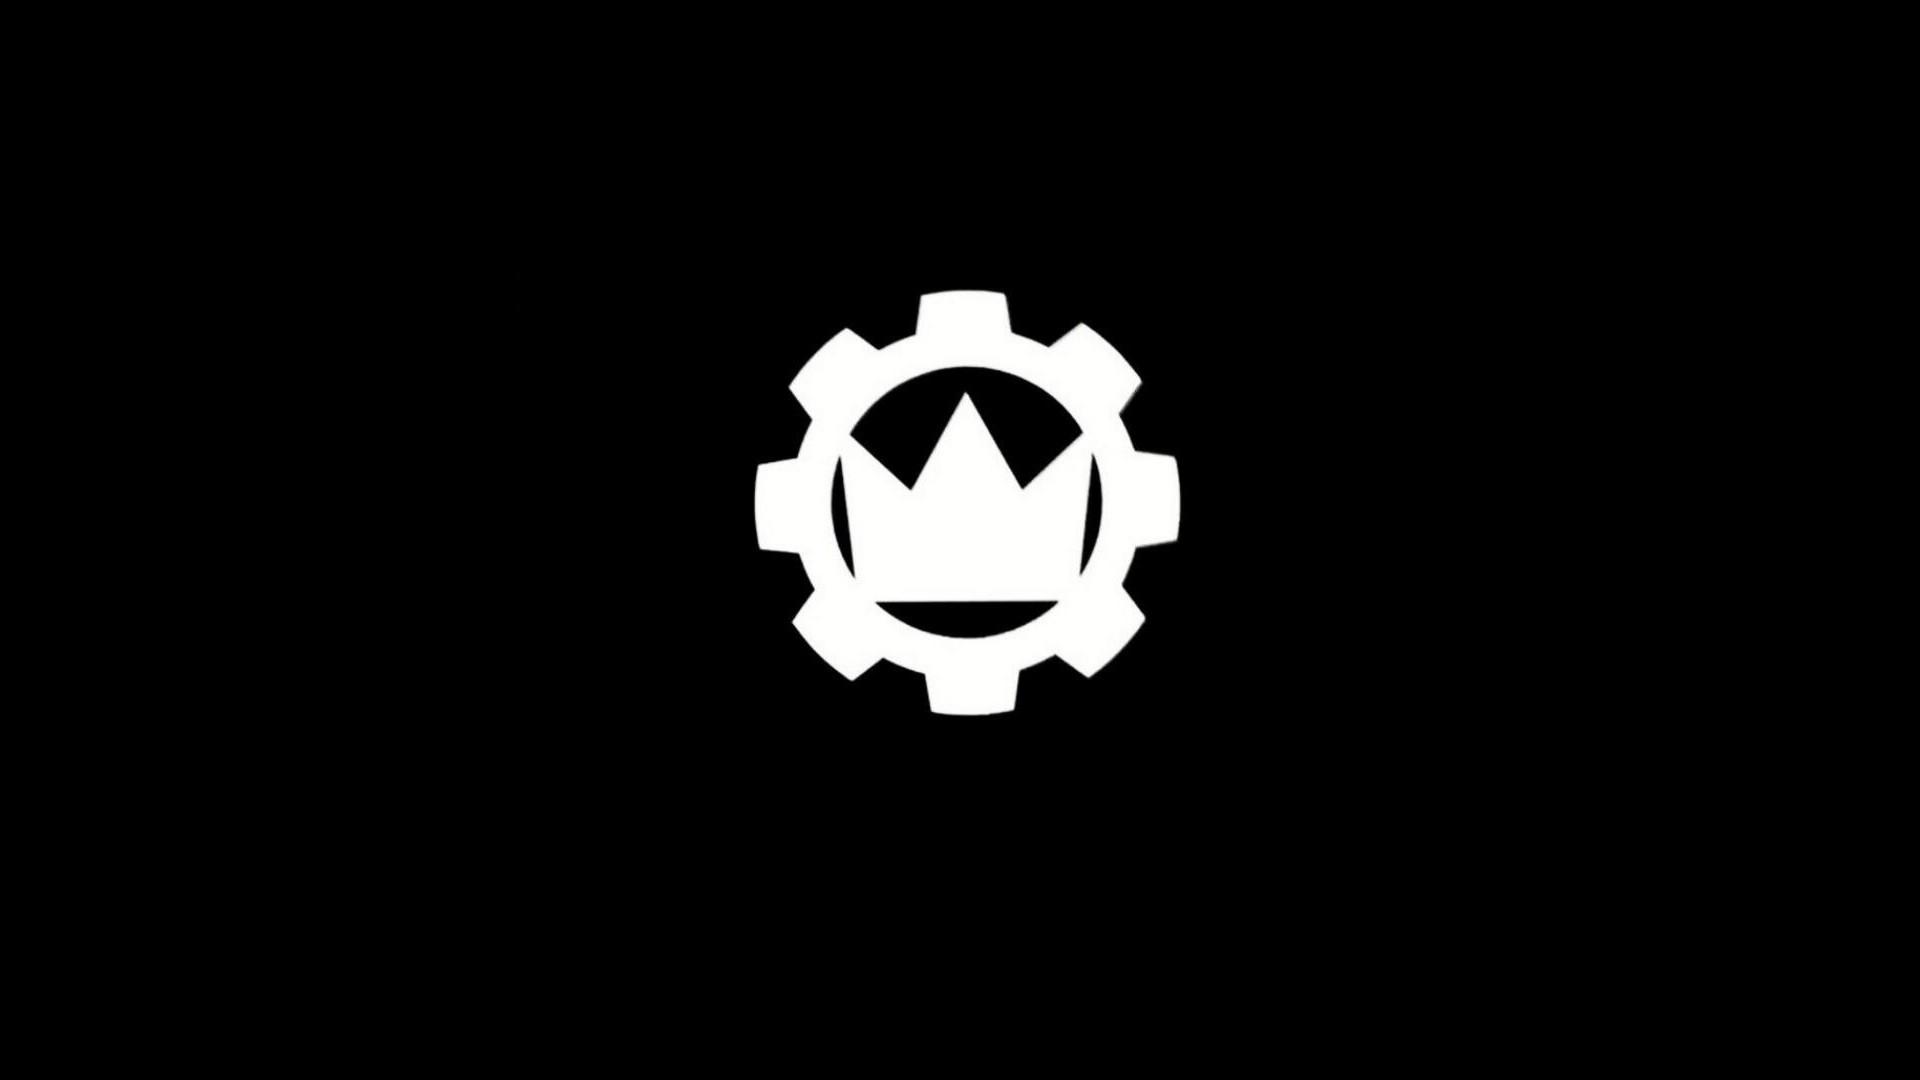 Logo Metal Band Metalcore Brand Crown The Empire Symbol Computer Wallpaper Font